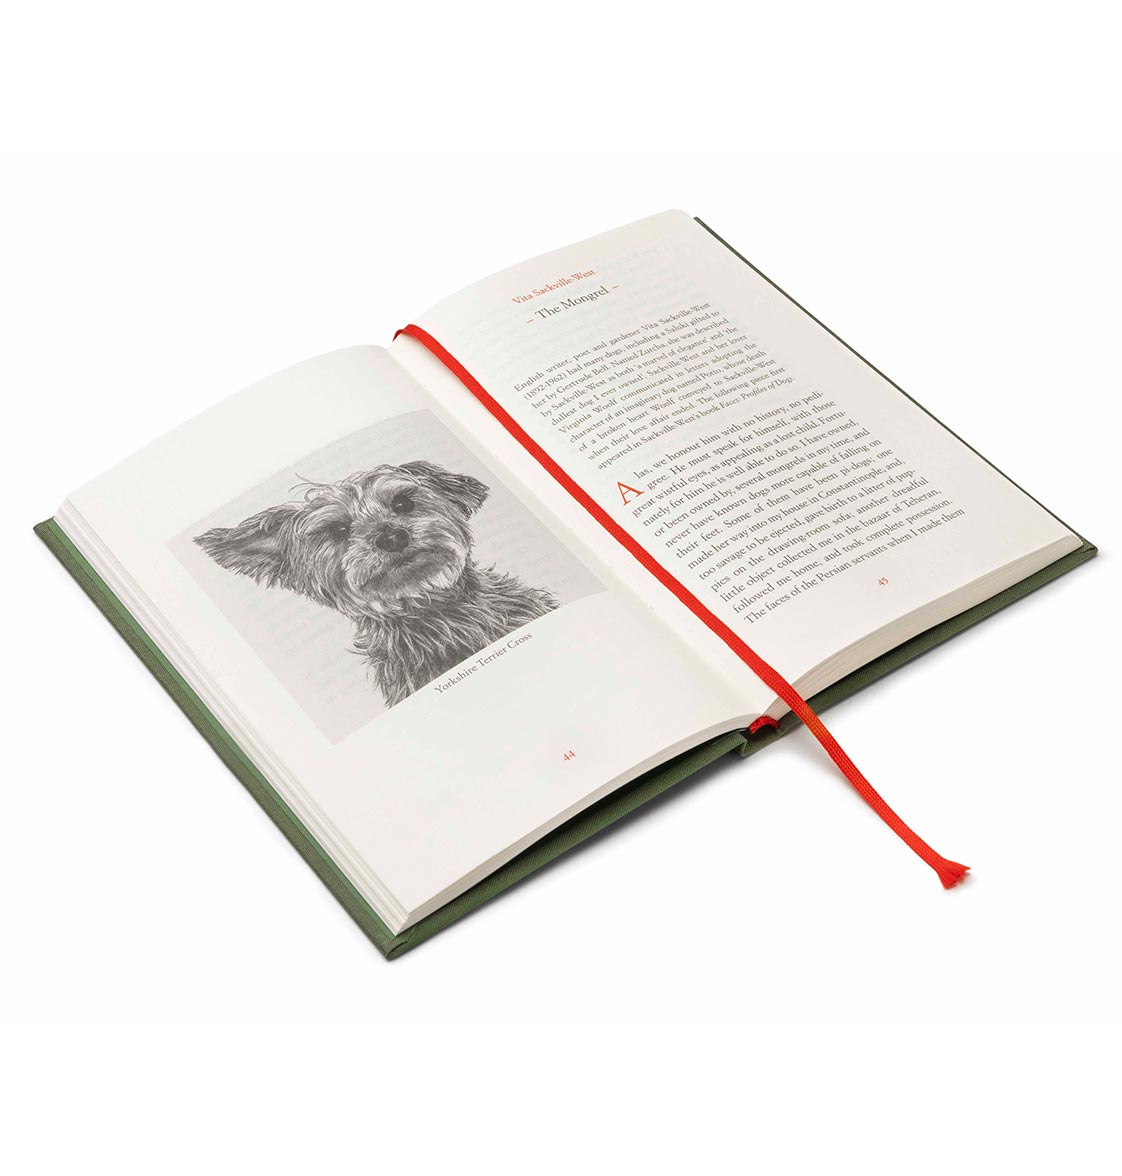 ON-DOGS-INTERIOR-MONGREL-2Single-Book-Close-ups